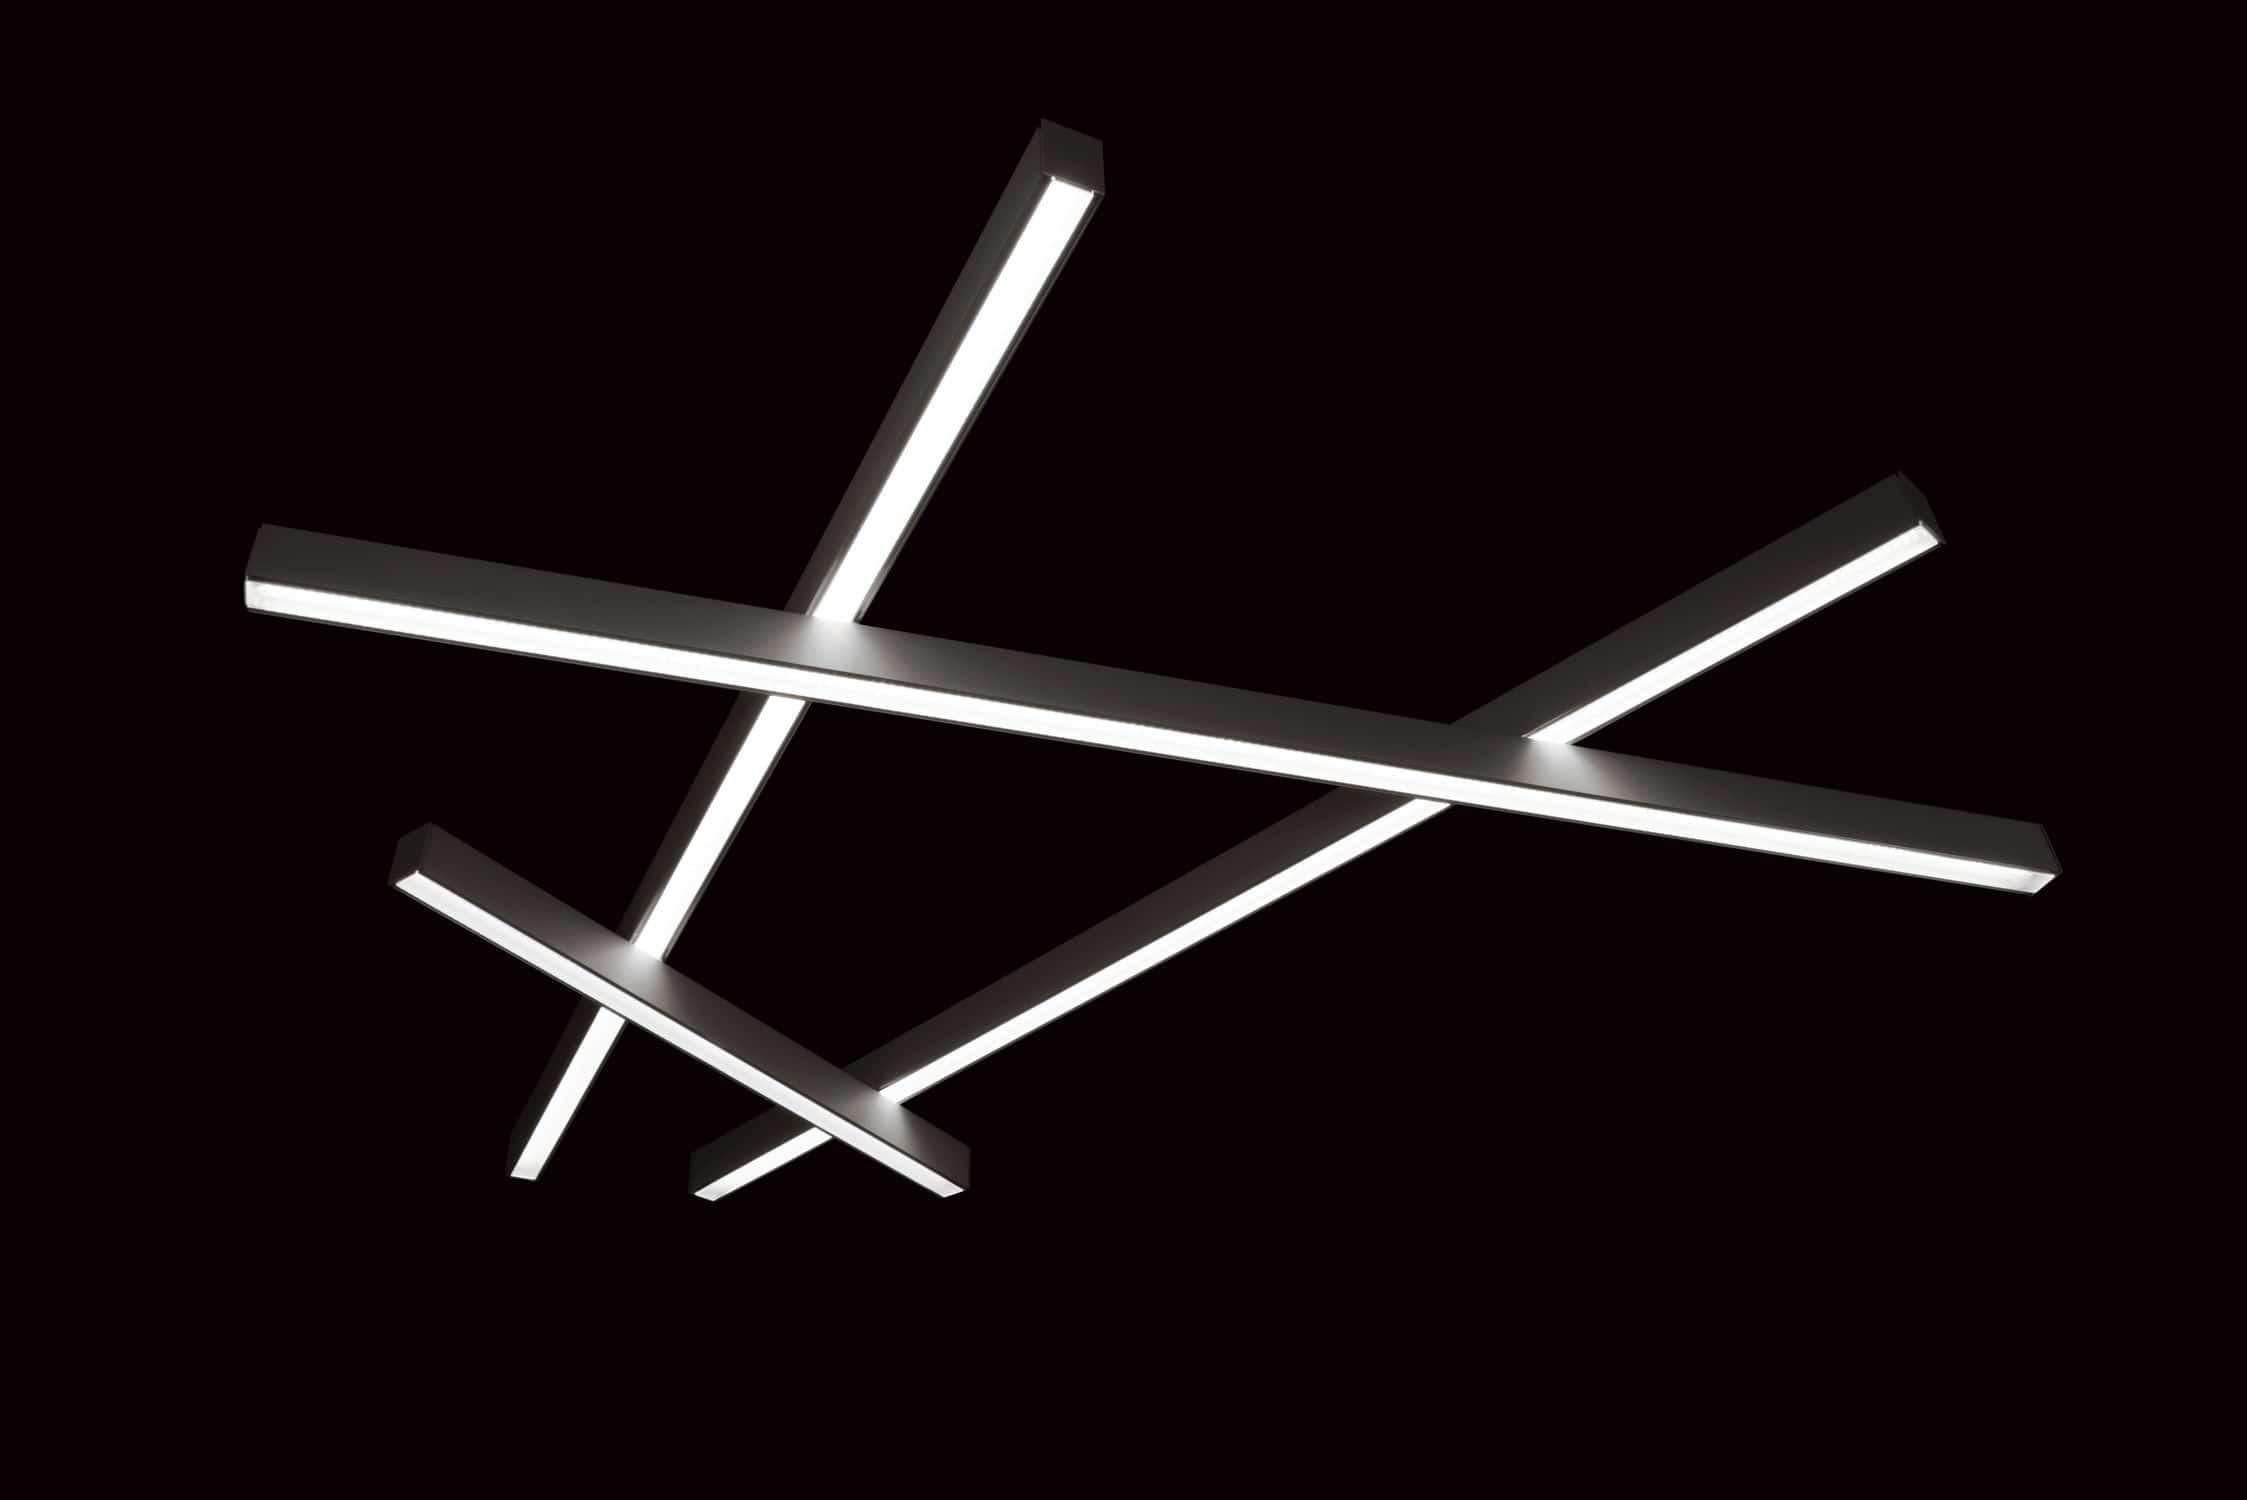 Hängeleuchte / LED / linear / modulare Beleuchtungssysteme ...